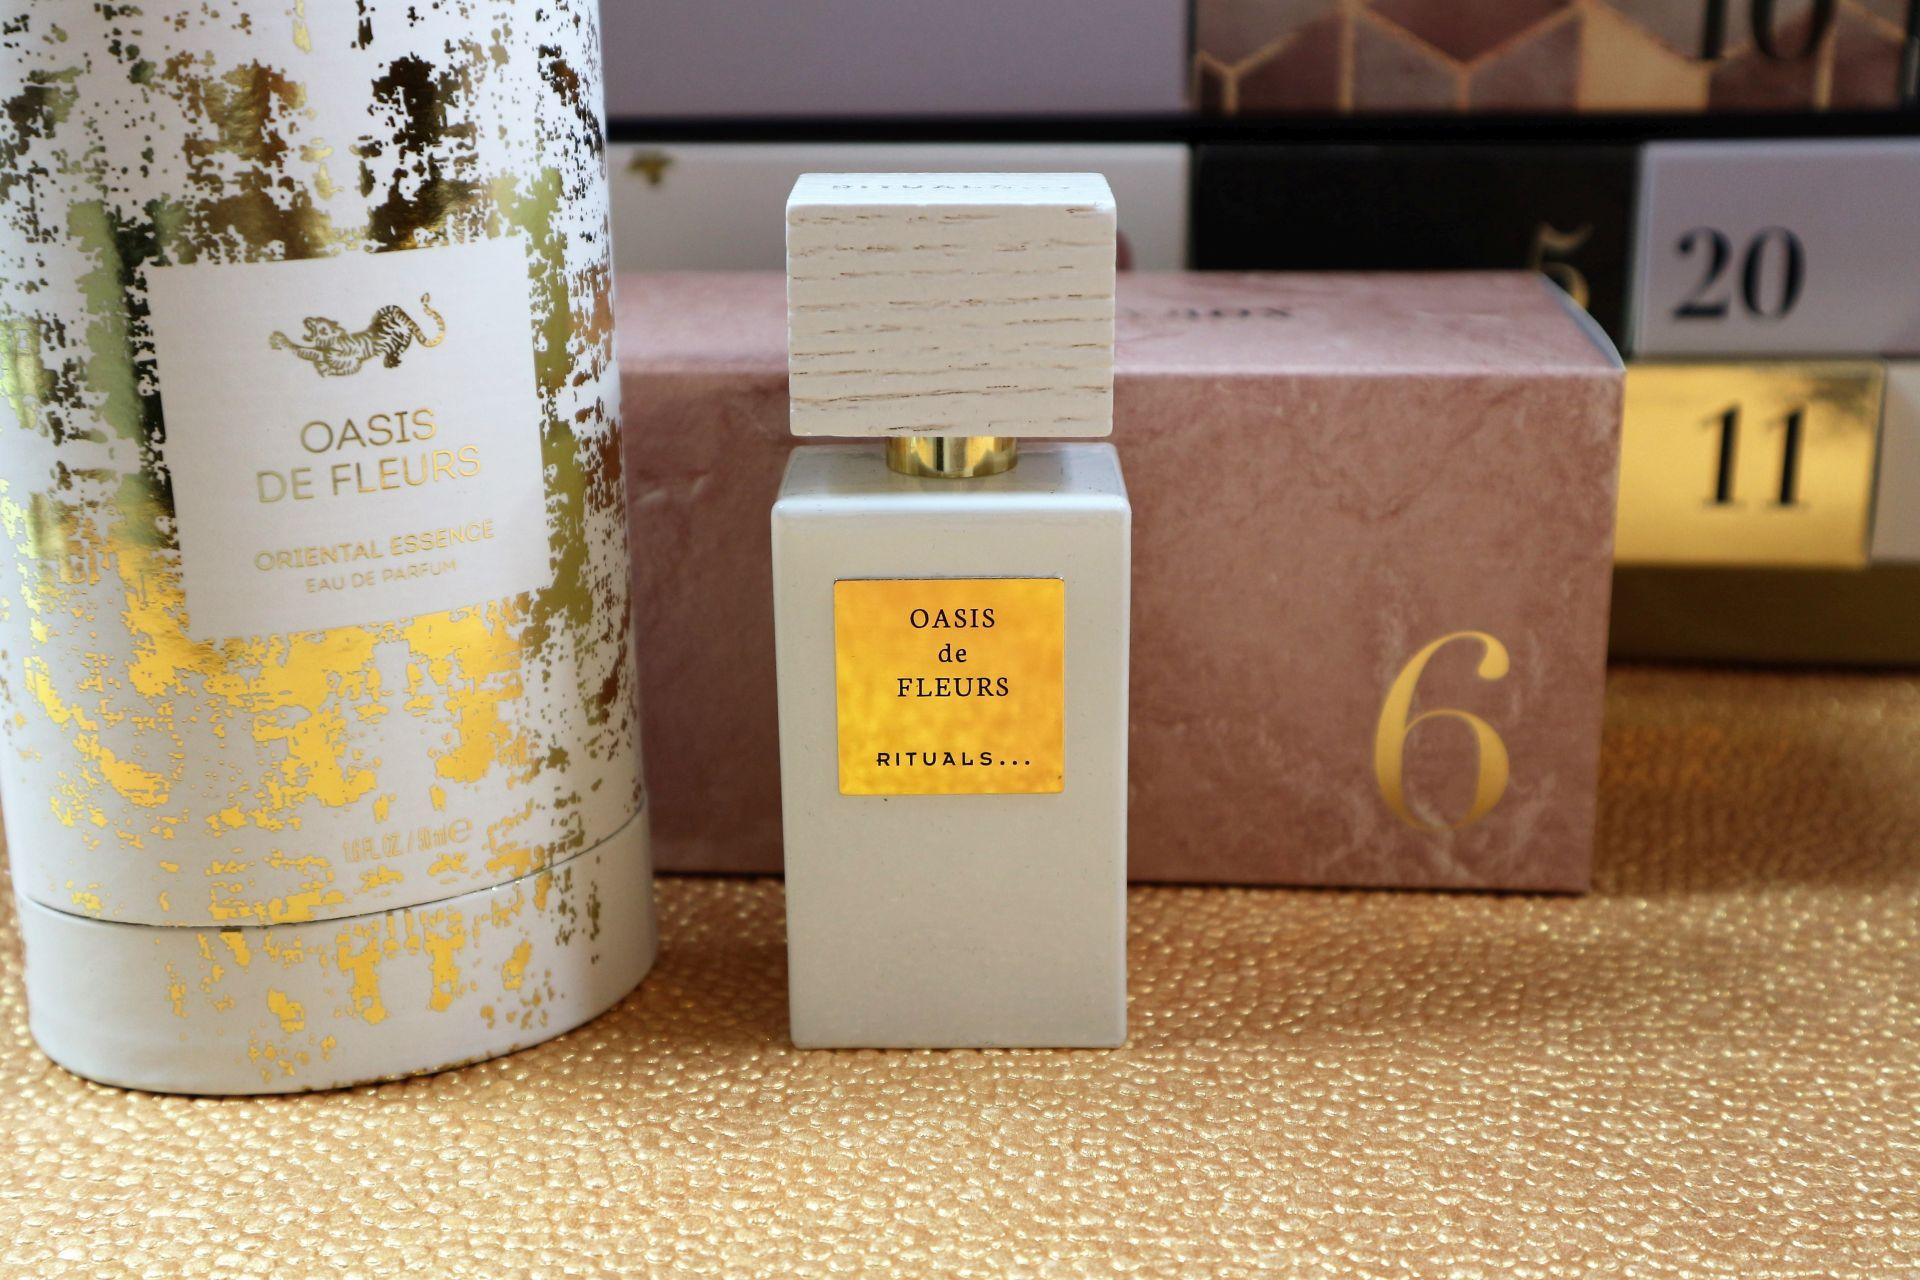 Rituals Parfum Oasis de Fleurs